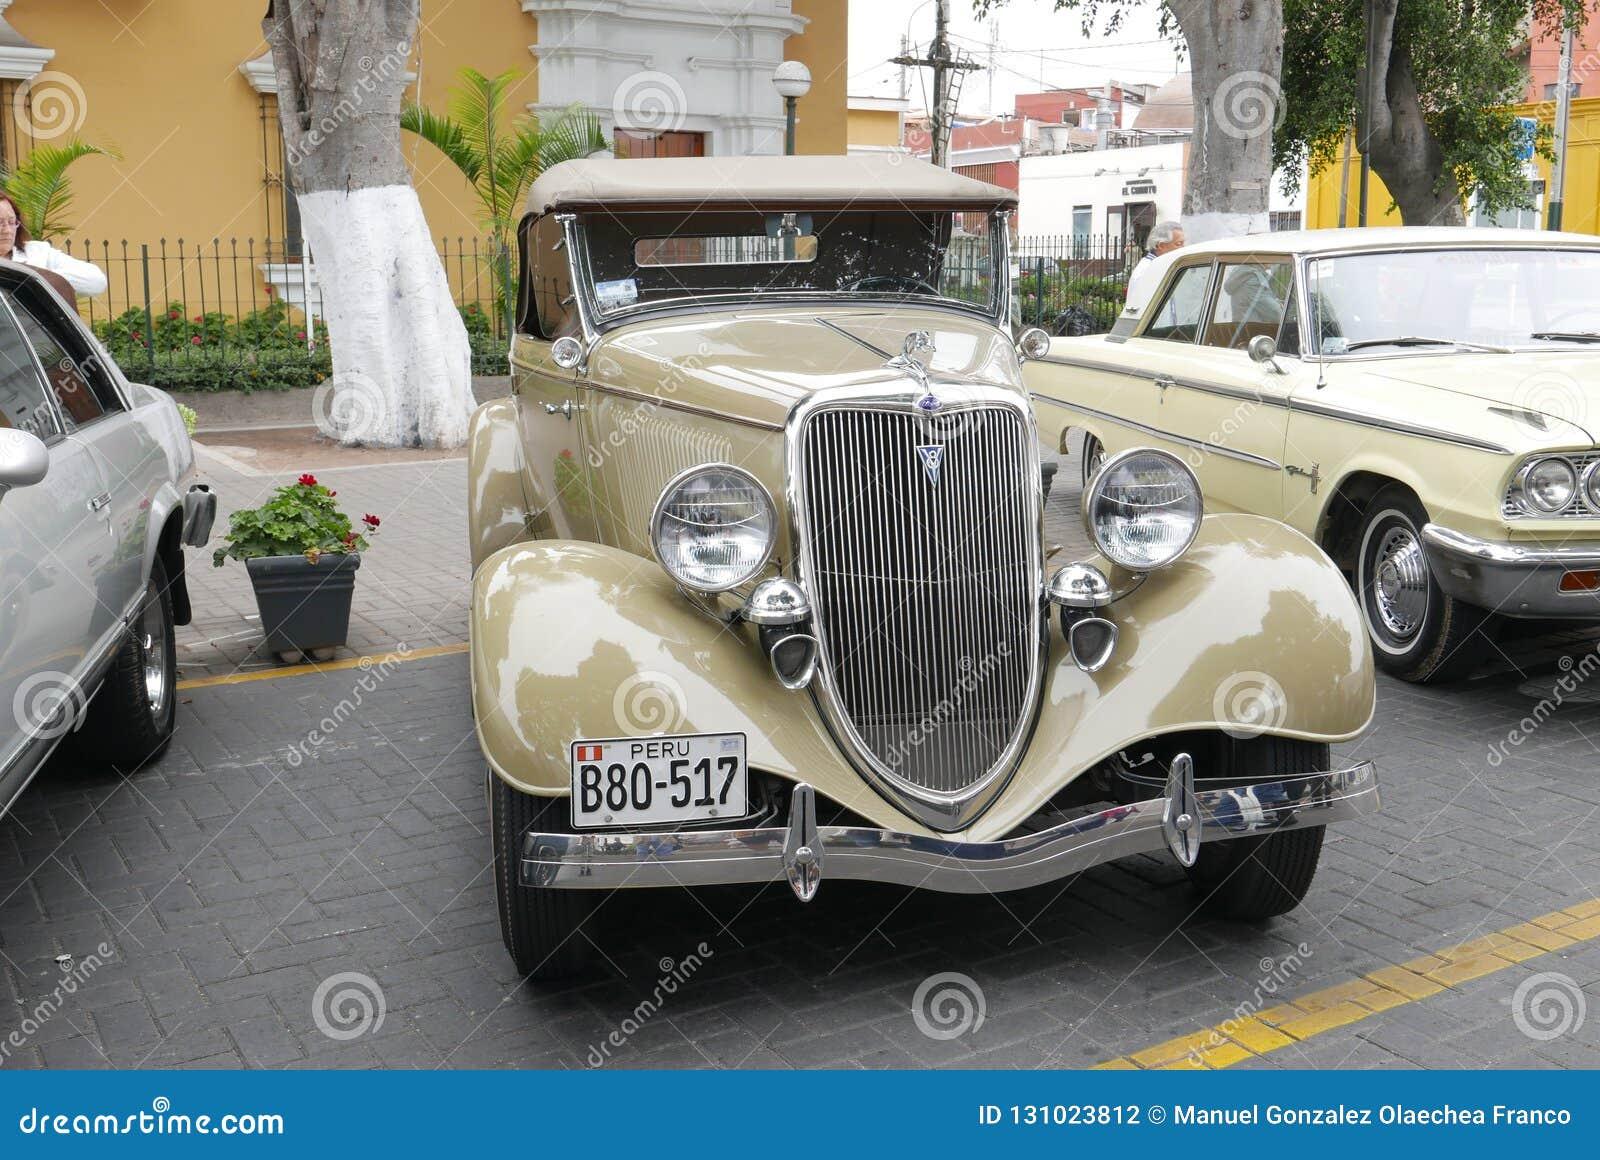 Бежевый родстер 1932 Форда V8 в Barranco, Лиме